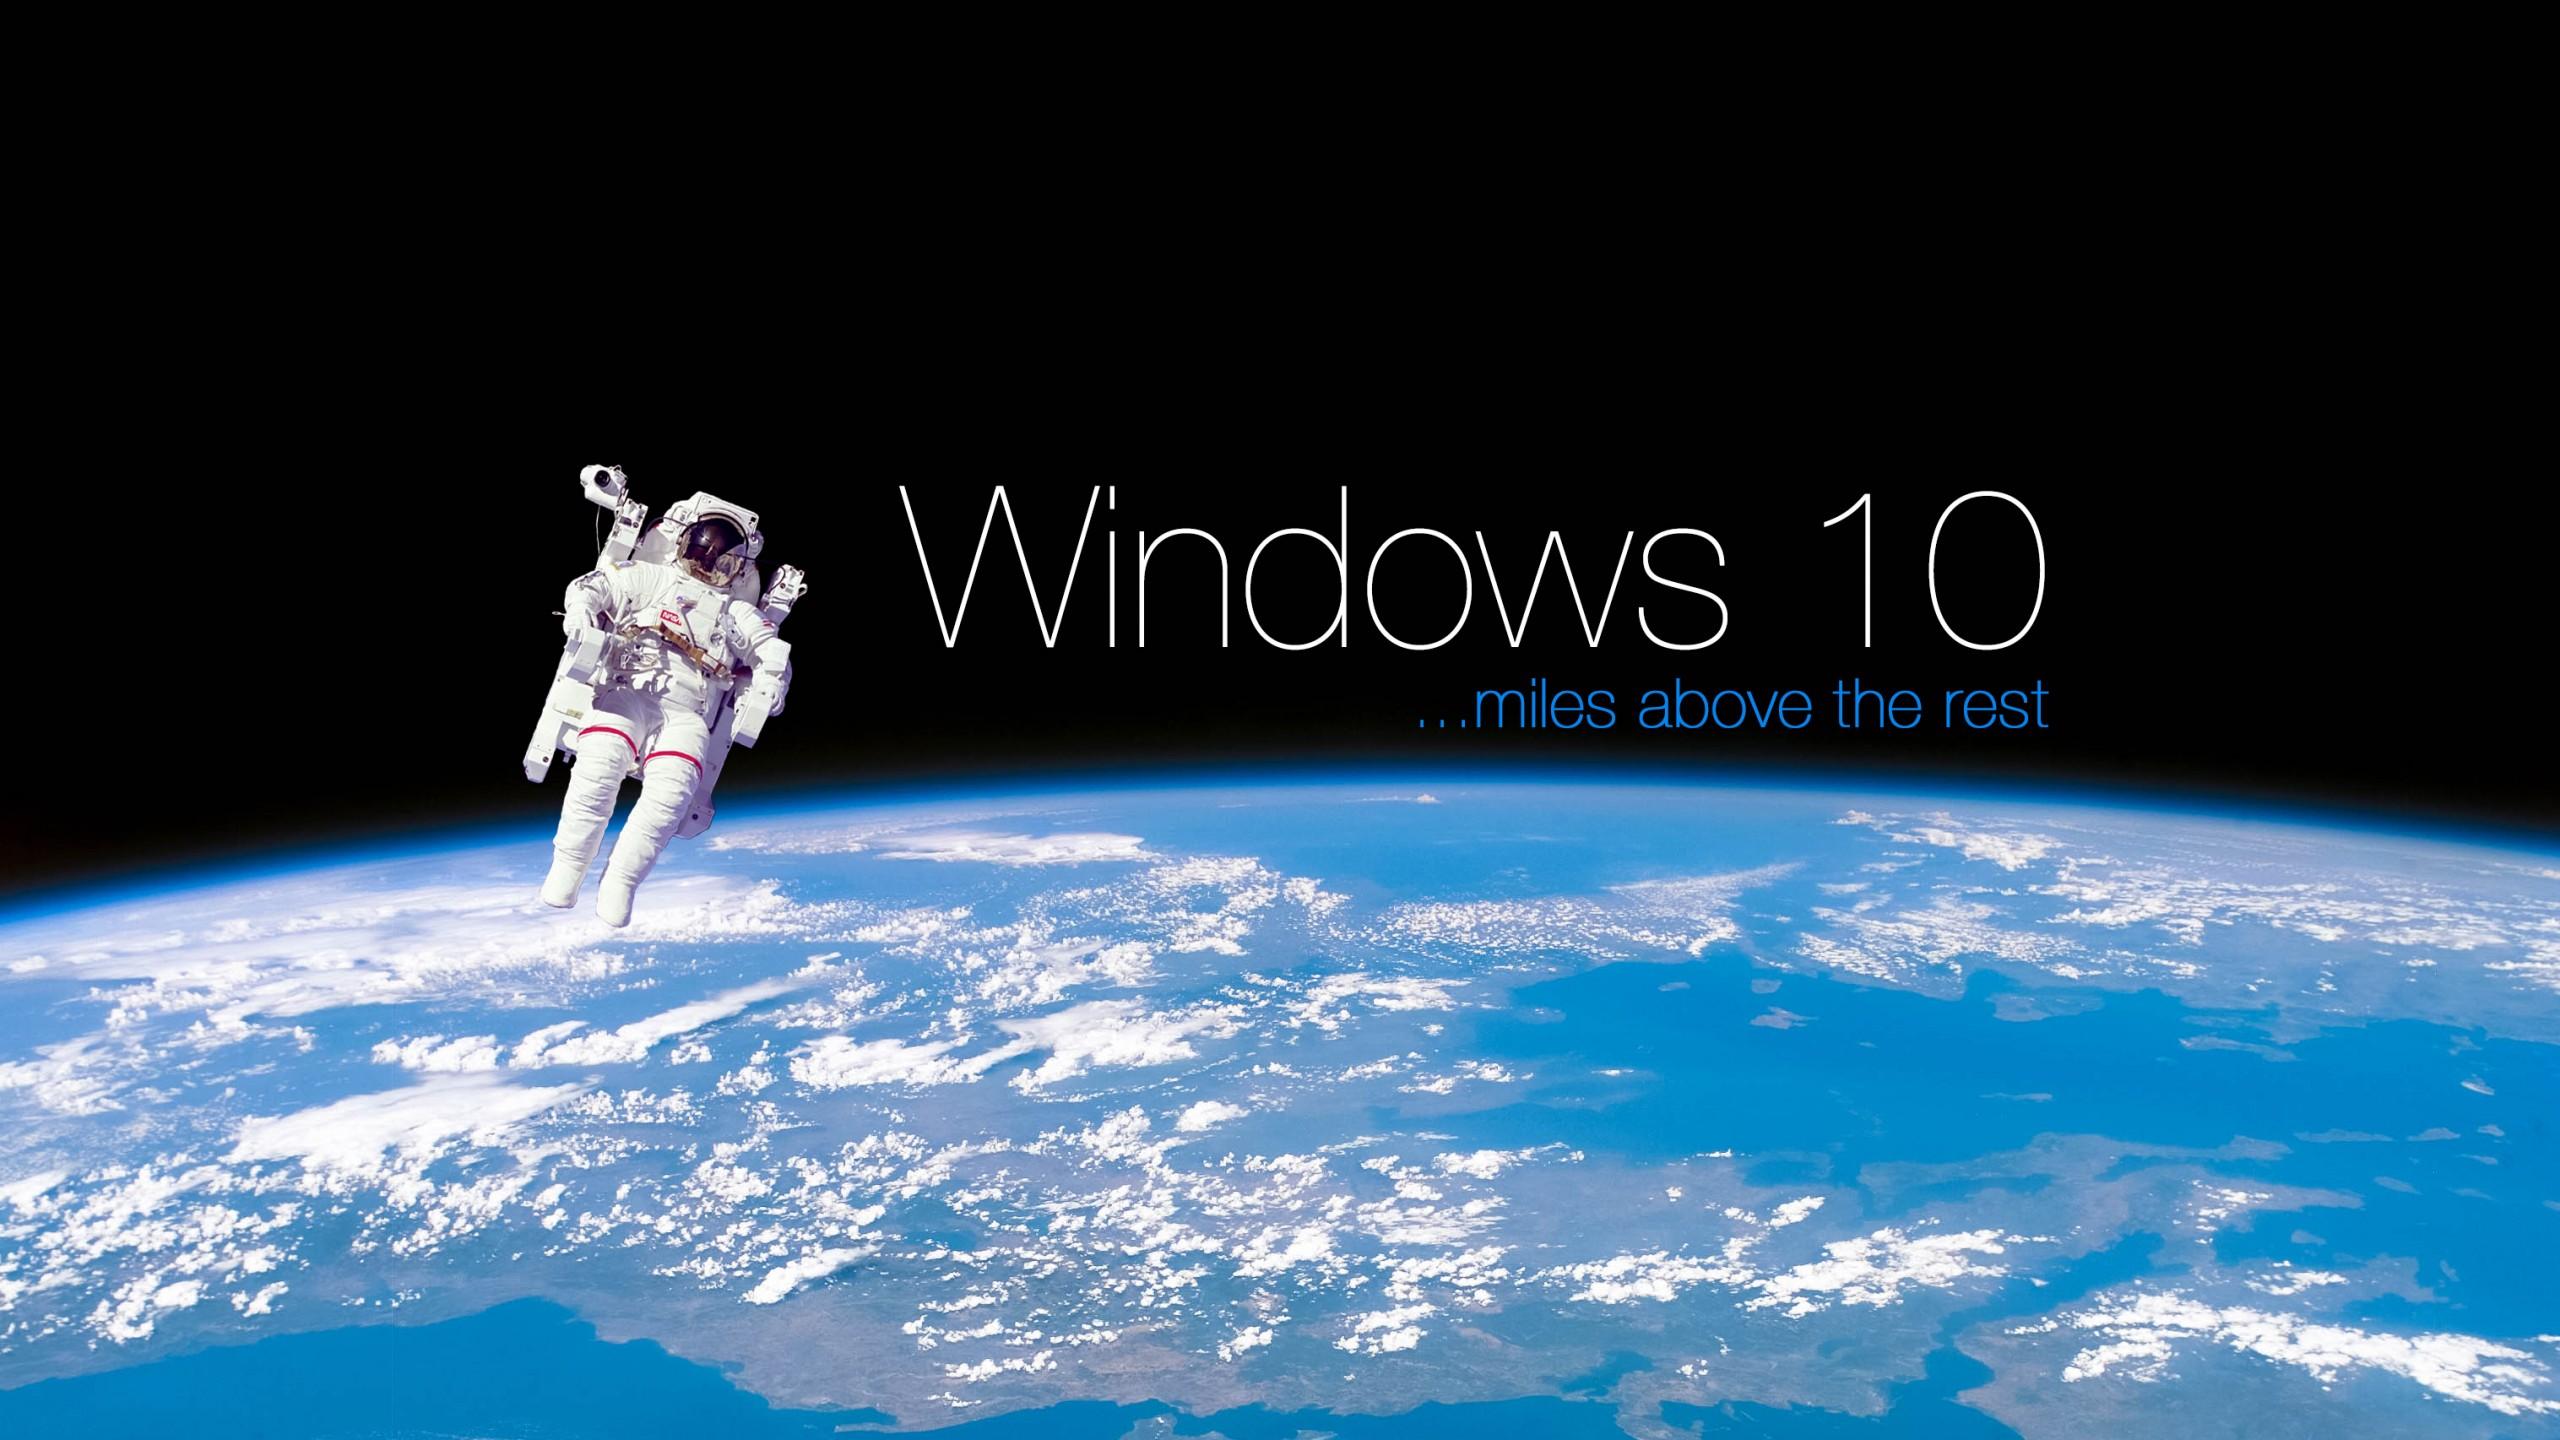 Windows 10 space 4k wallpaper 2560x1440   Wallpaper   Wallpaper Style 2560x1440